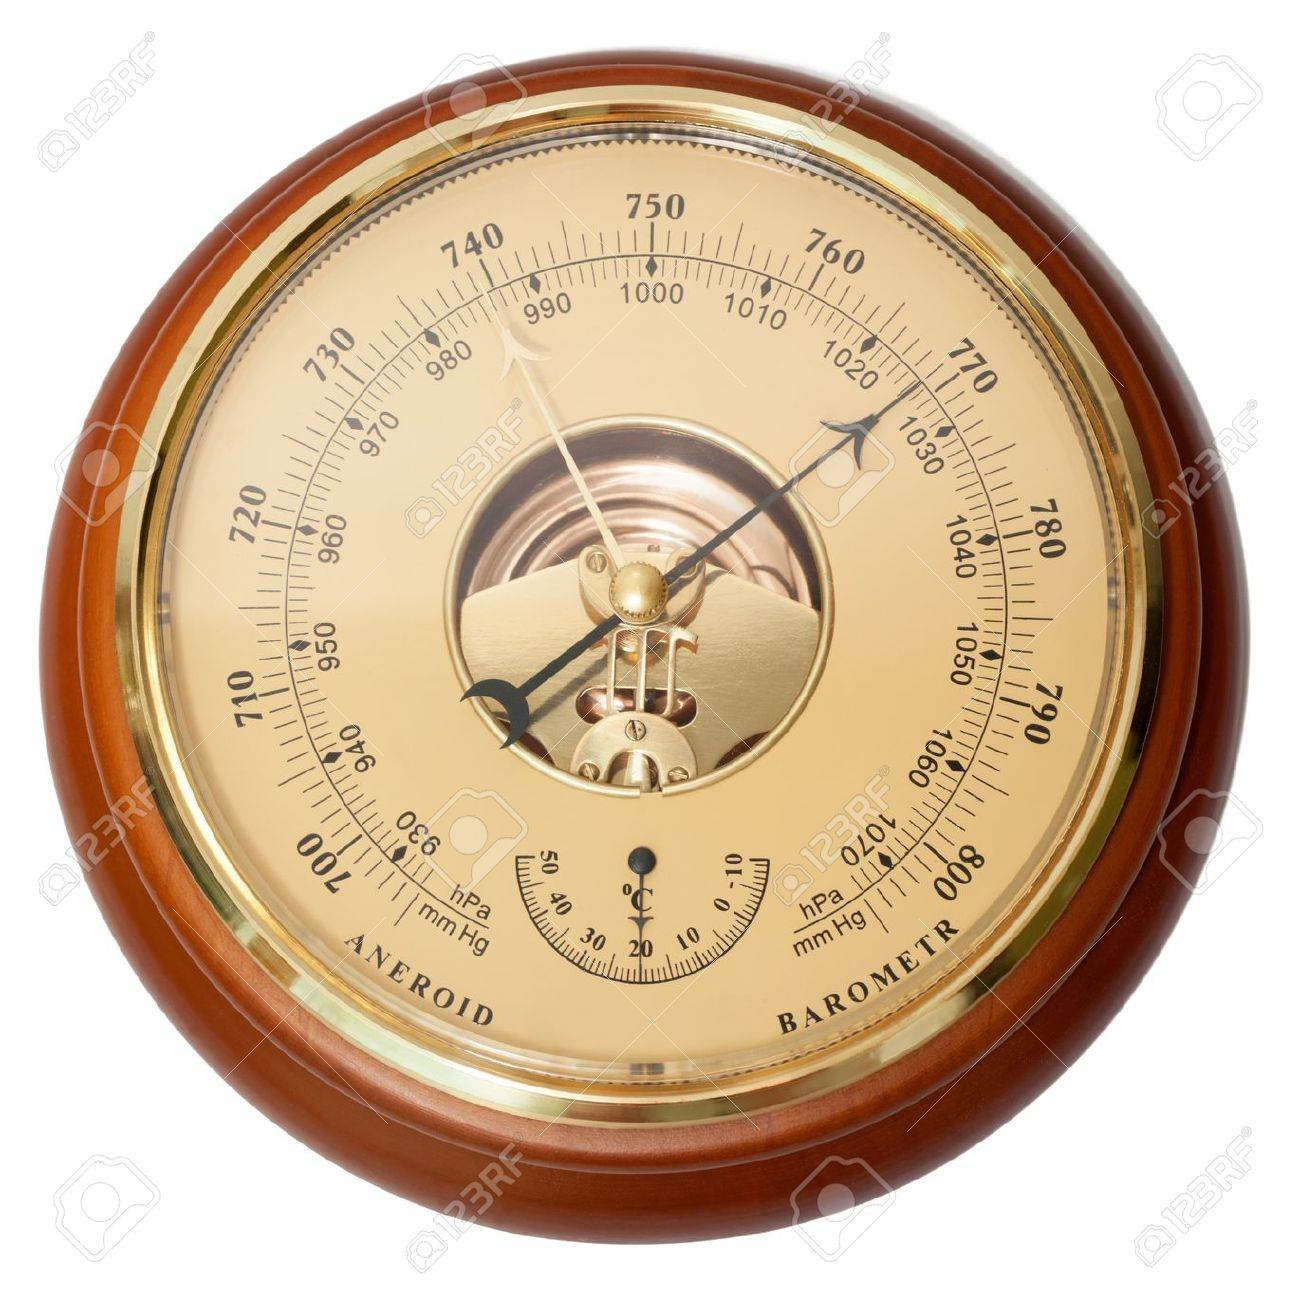 Vintage aneroid barometer on isolated white Stock Photo - 17565530